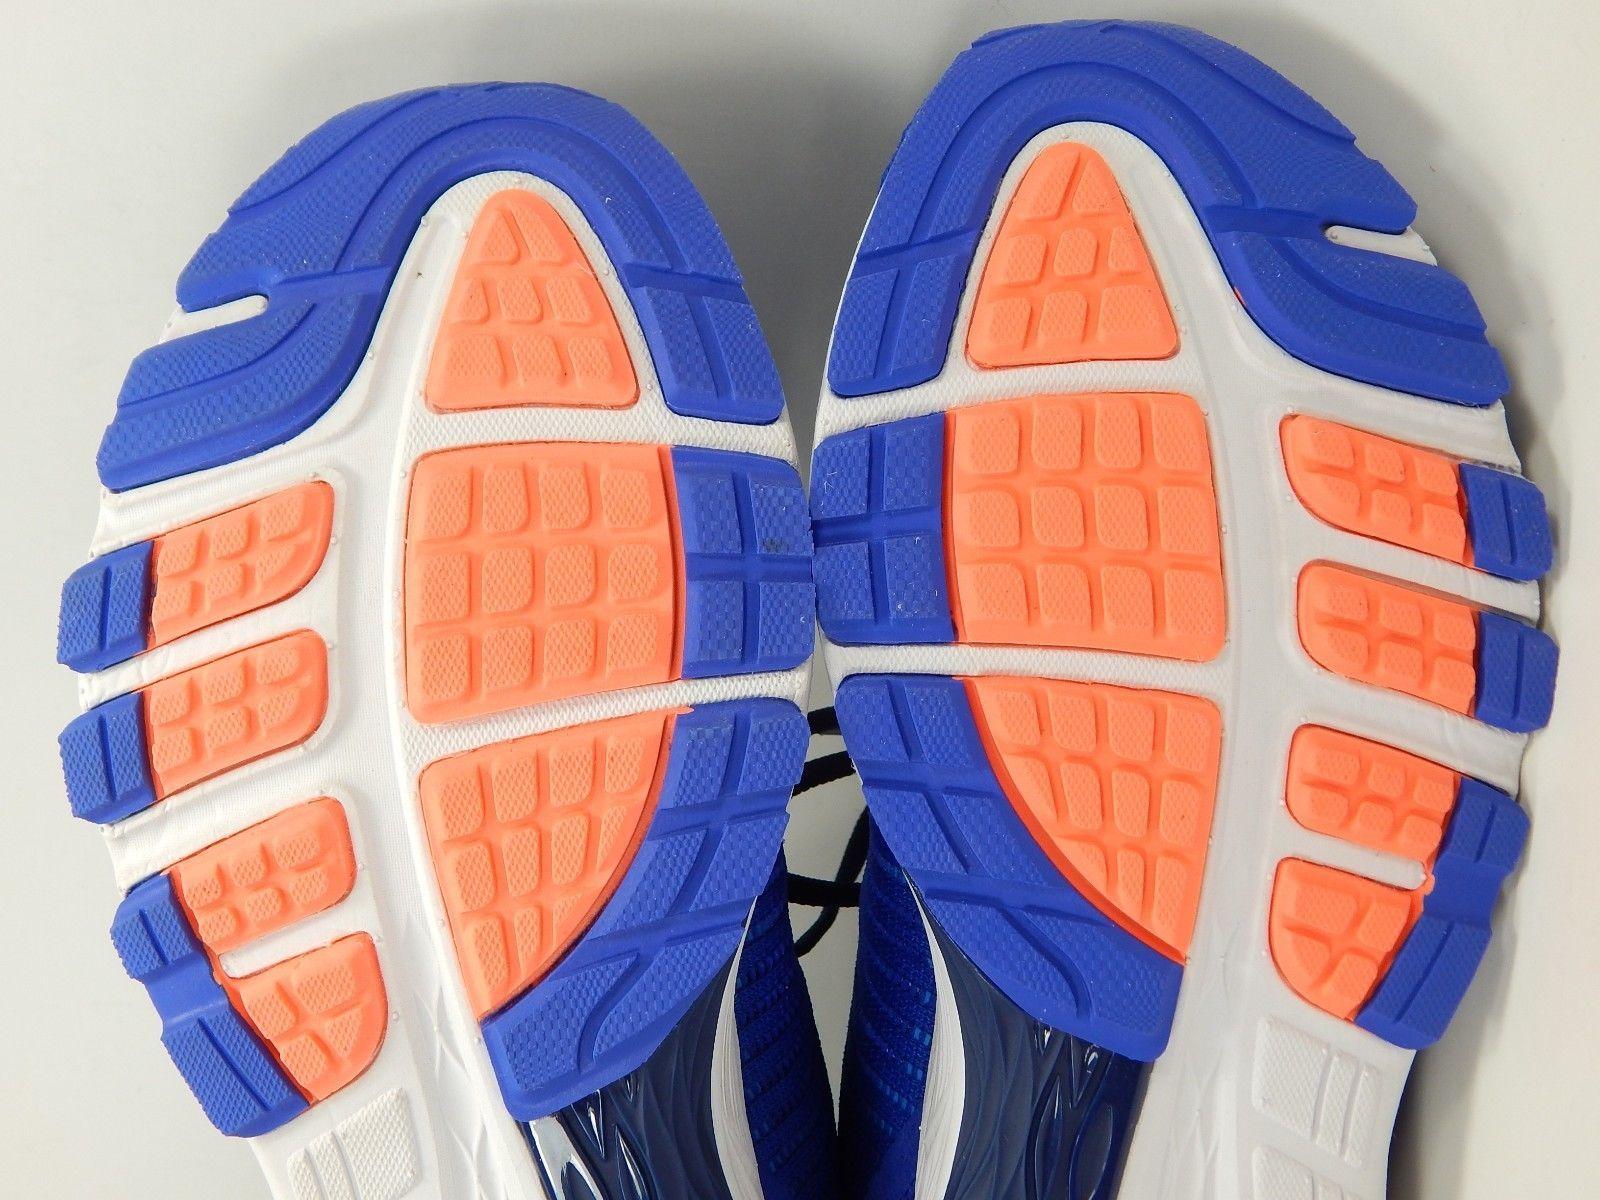 Asics DynaFlyte 2 Size US 8.5 M (B) EU 40 Women's Running Shoes Blue T7D5N